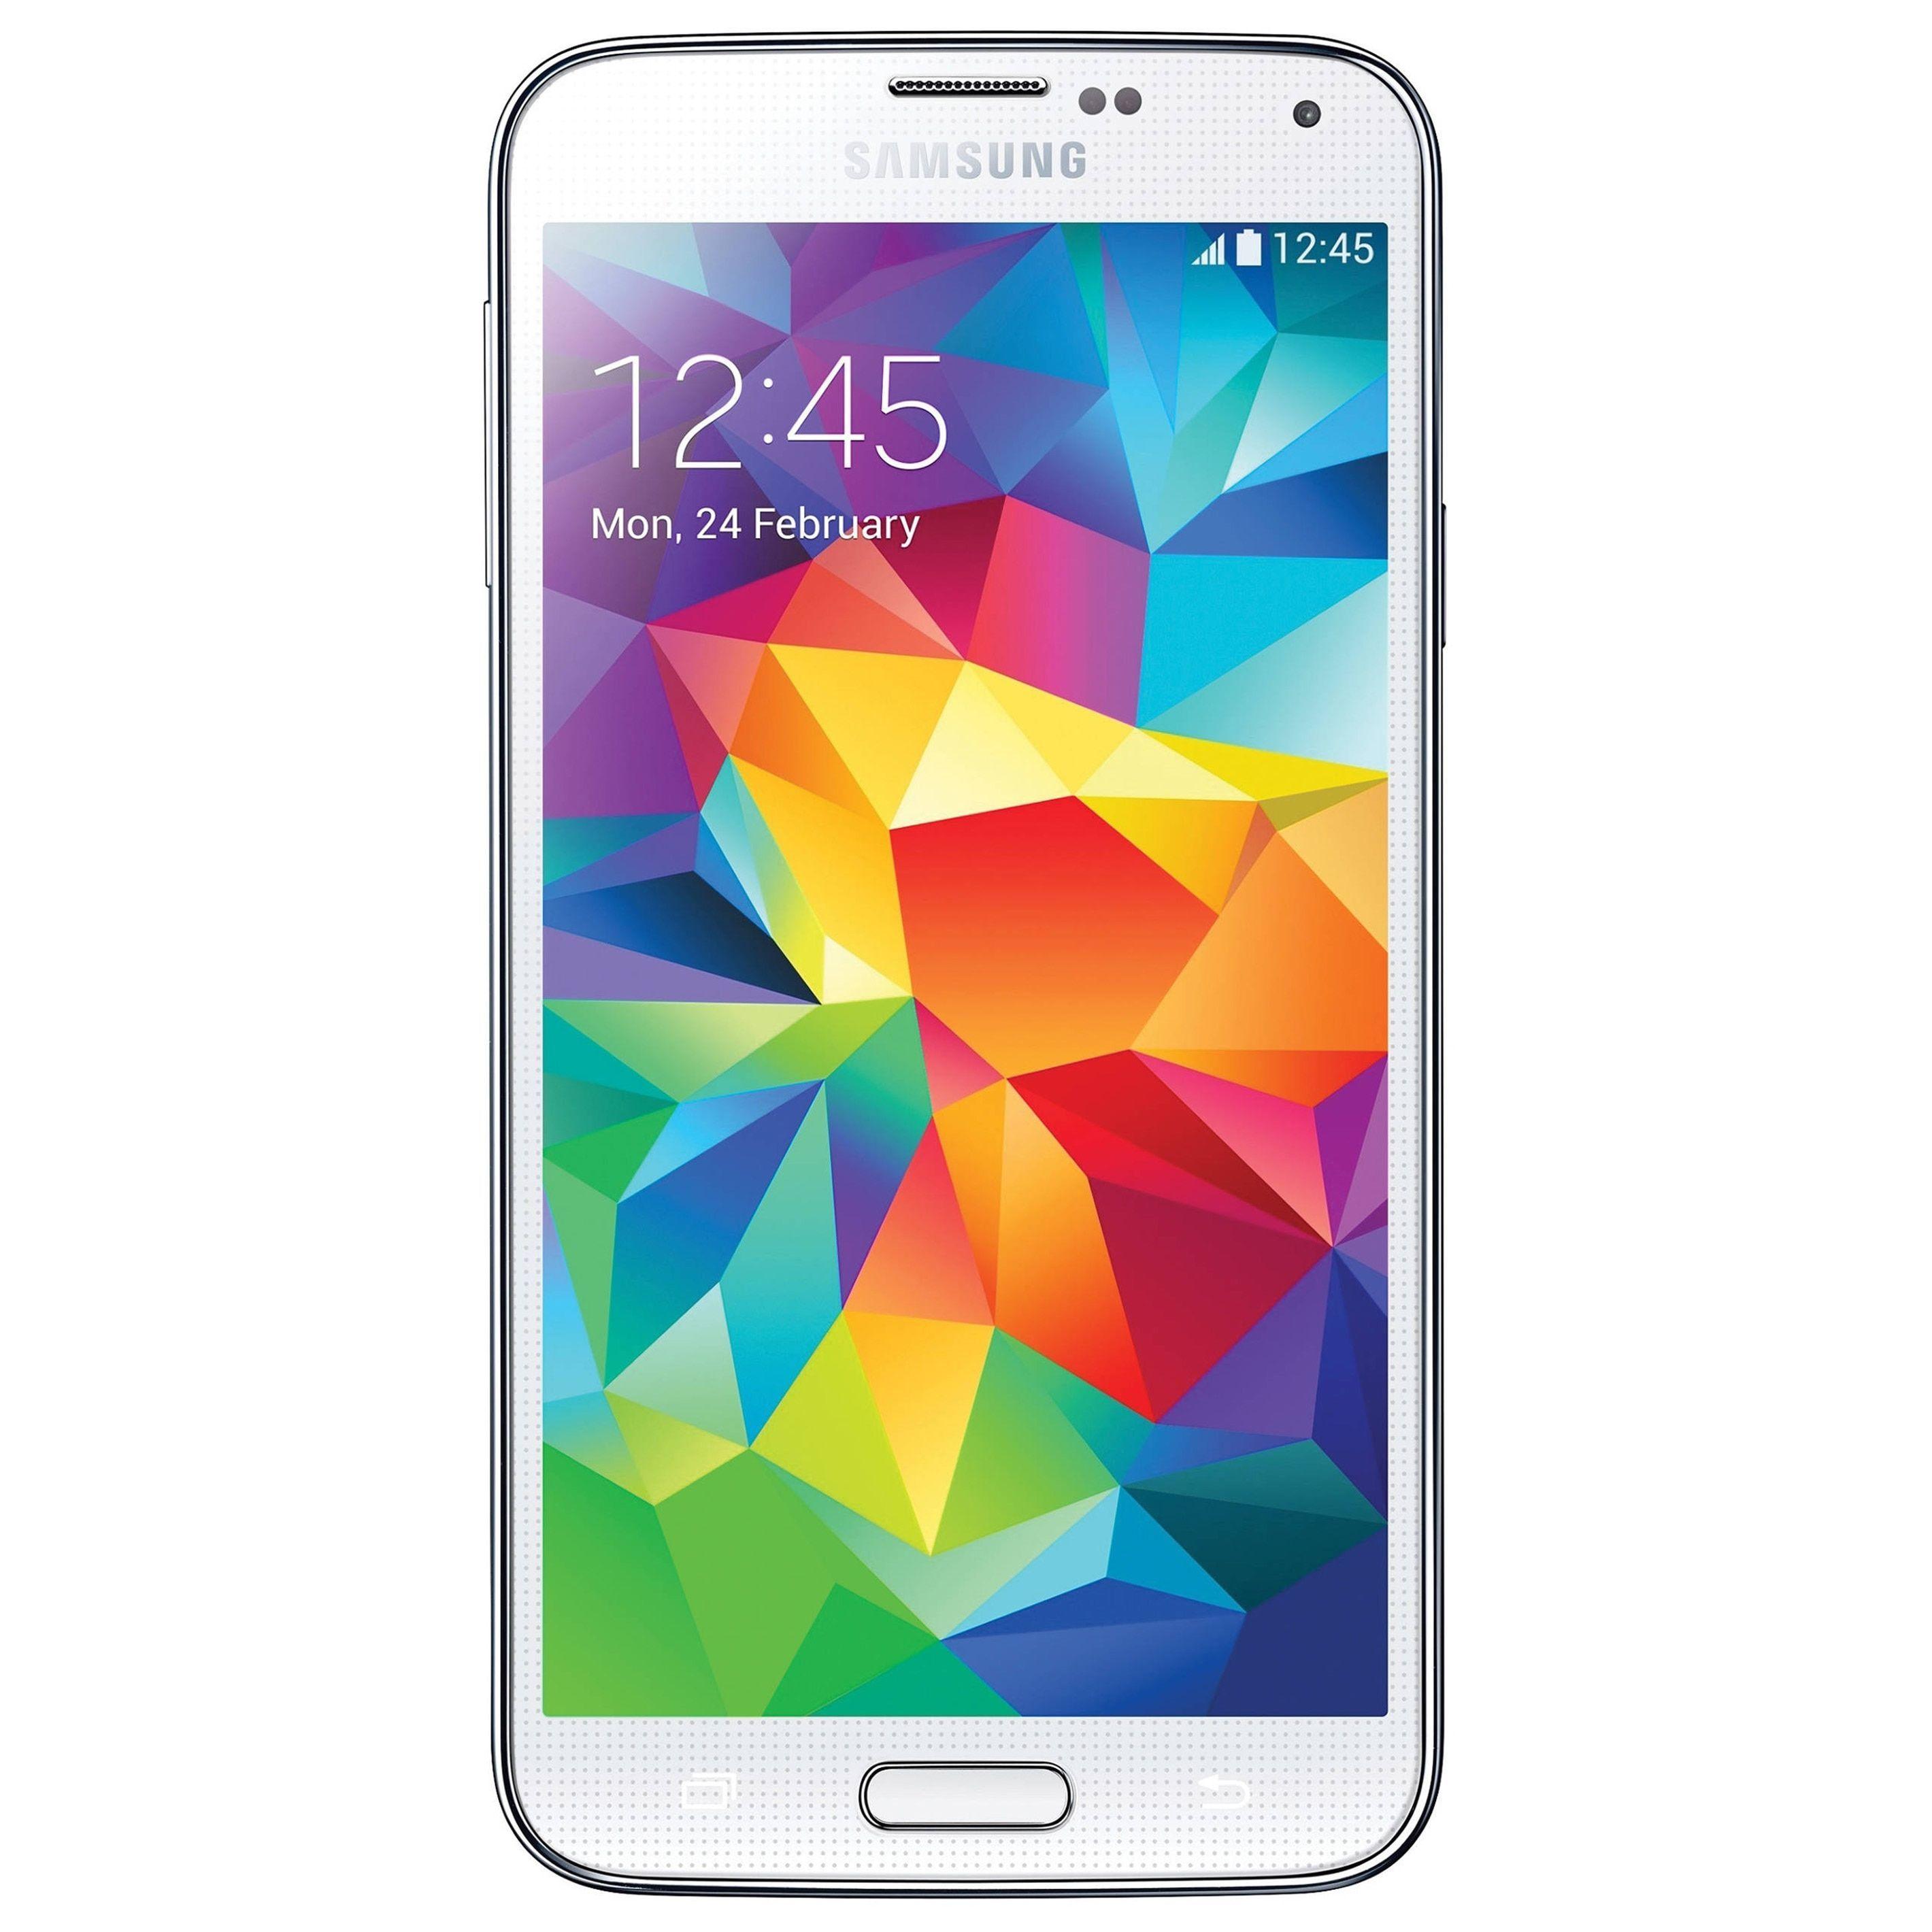 Samsung Galaxy S5 G900A 16GB AT&T Unlocked GSM Quad-Core 4G